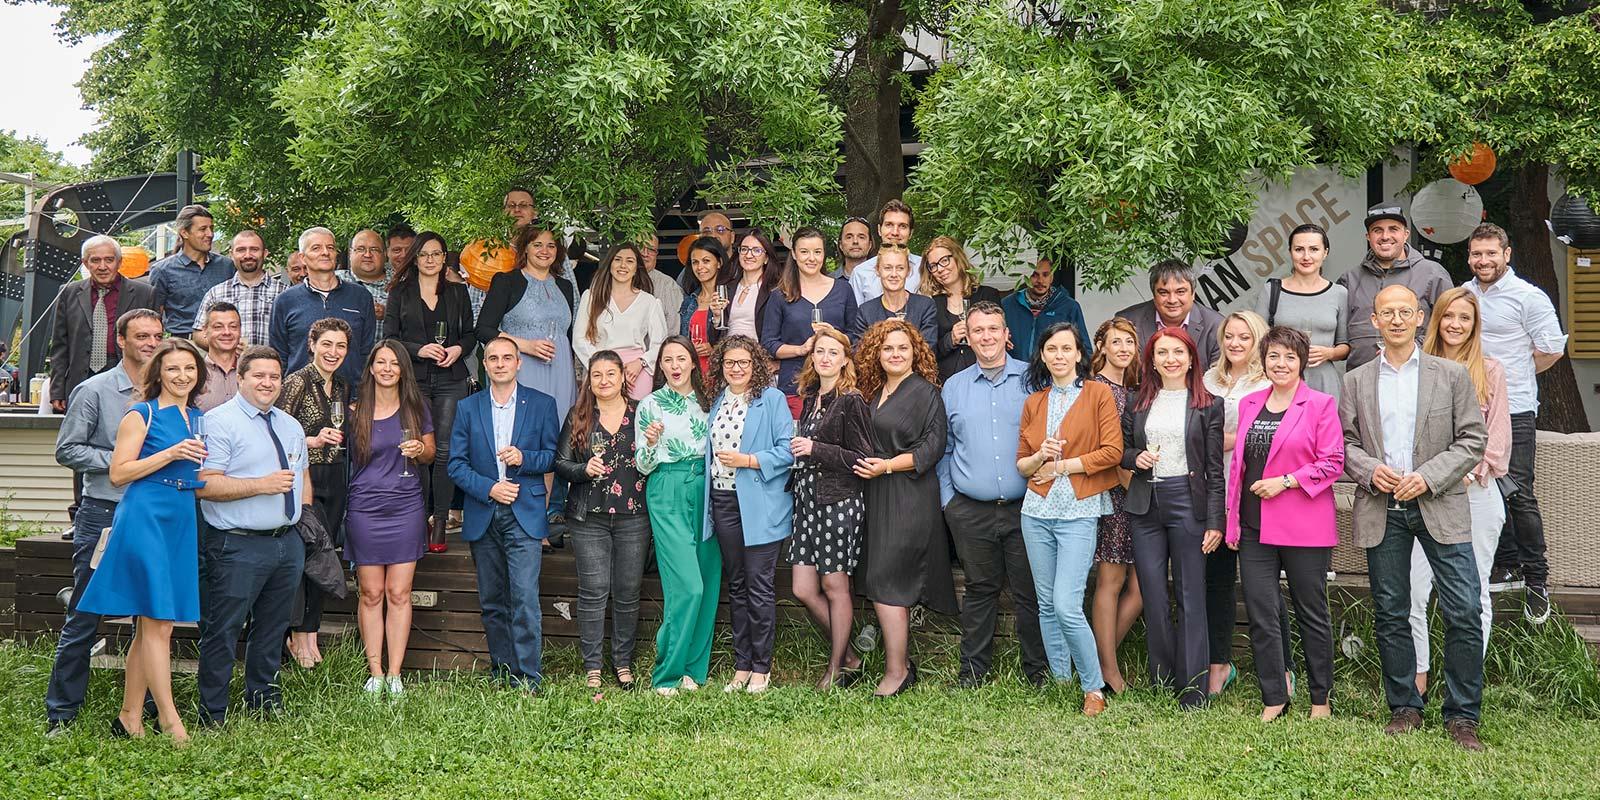 Balkan Services отпразнува своя 15-ти рожден ден! [ФОТО разказ] - balkanservices.com